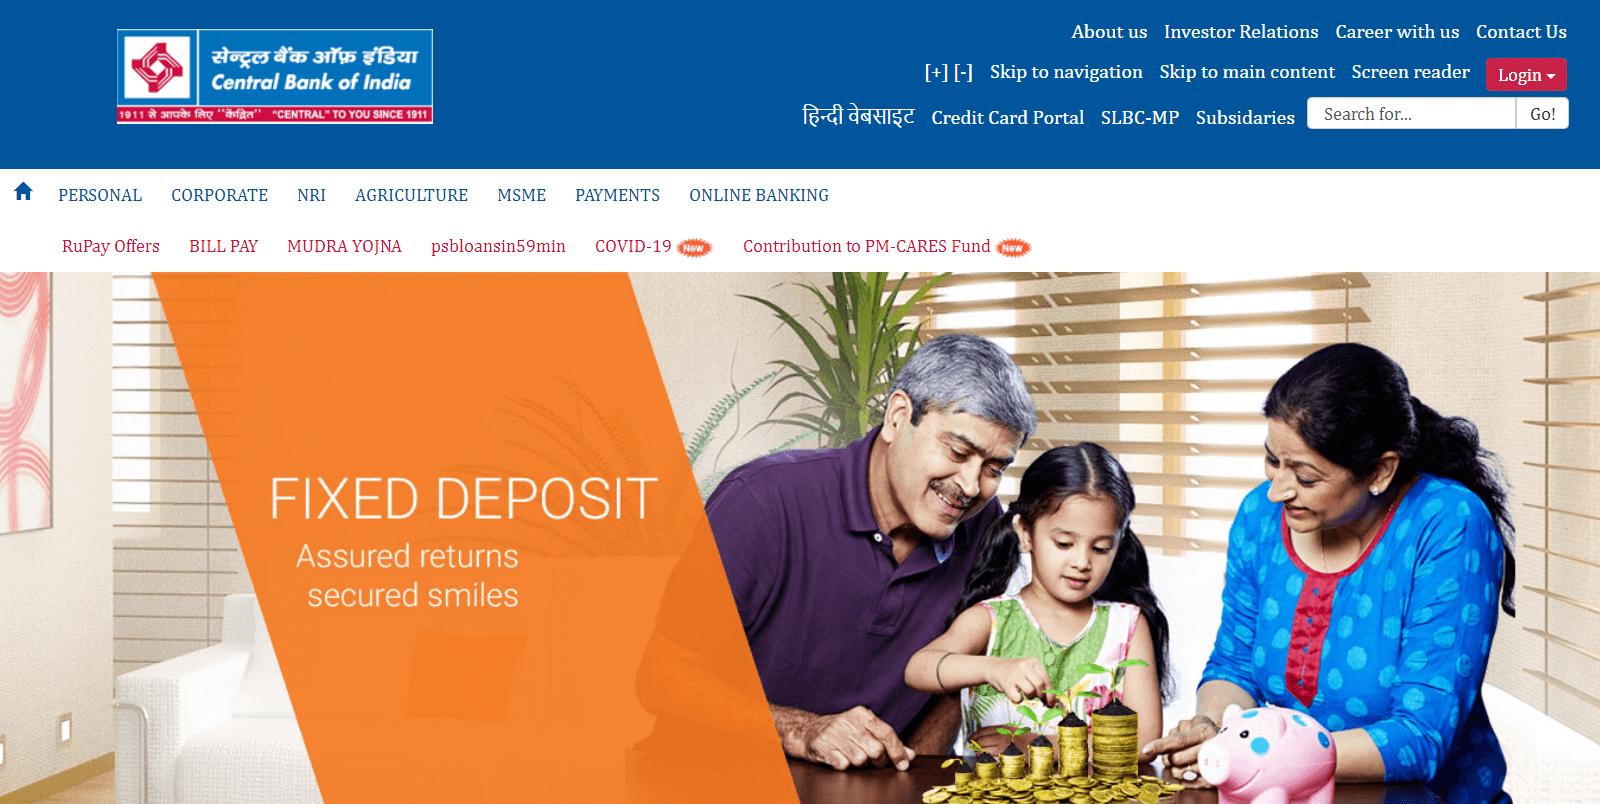 Central Bank of India RuPay Platinum Debit Card